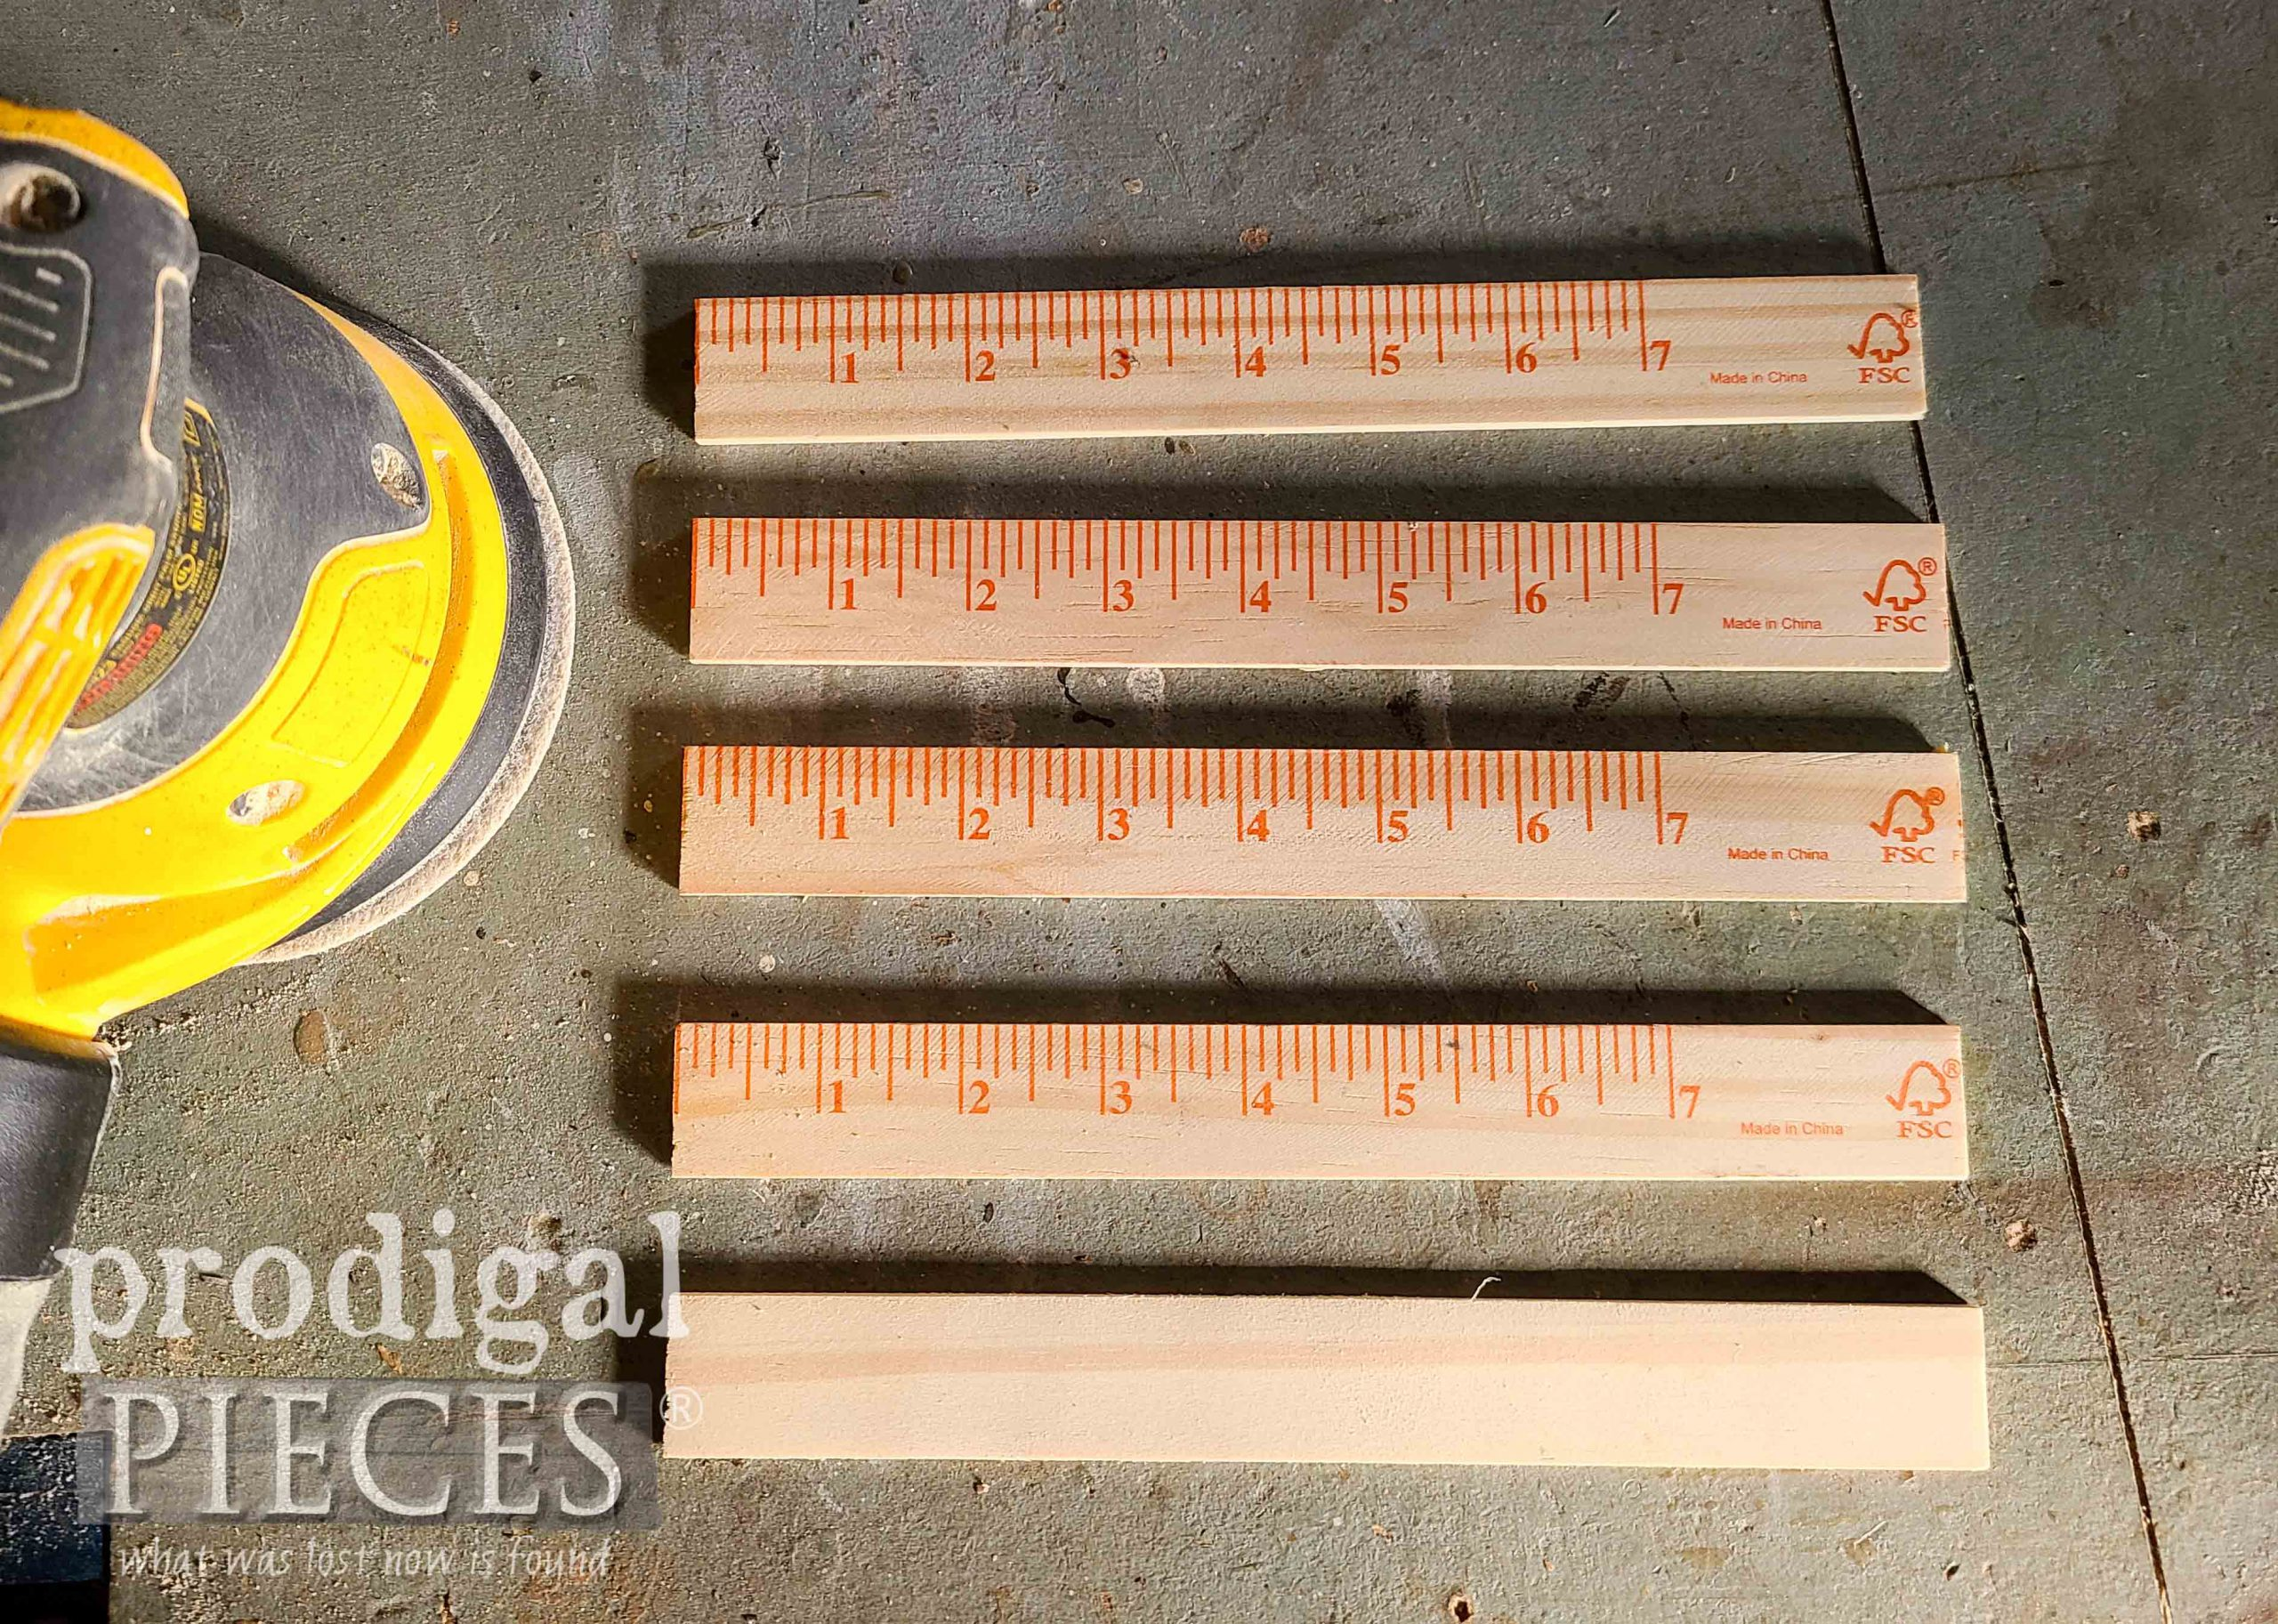 Sanding Paint Stir Sticks for DIY Wall Pocket by Larissa of Prodigal Pieces | prodigalpieces.com #prodigalpieces